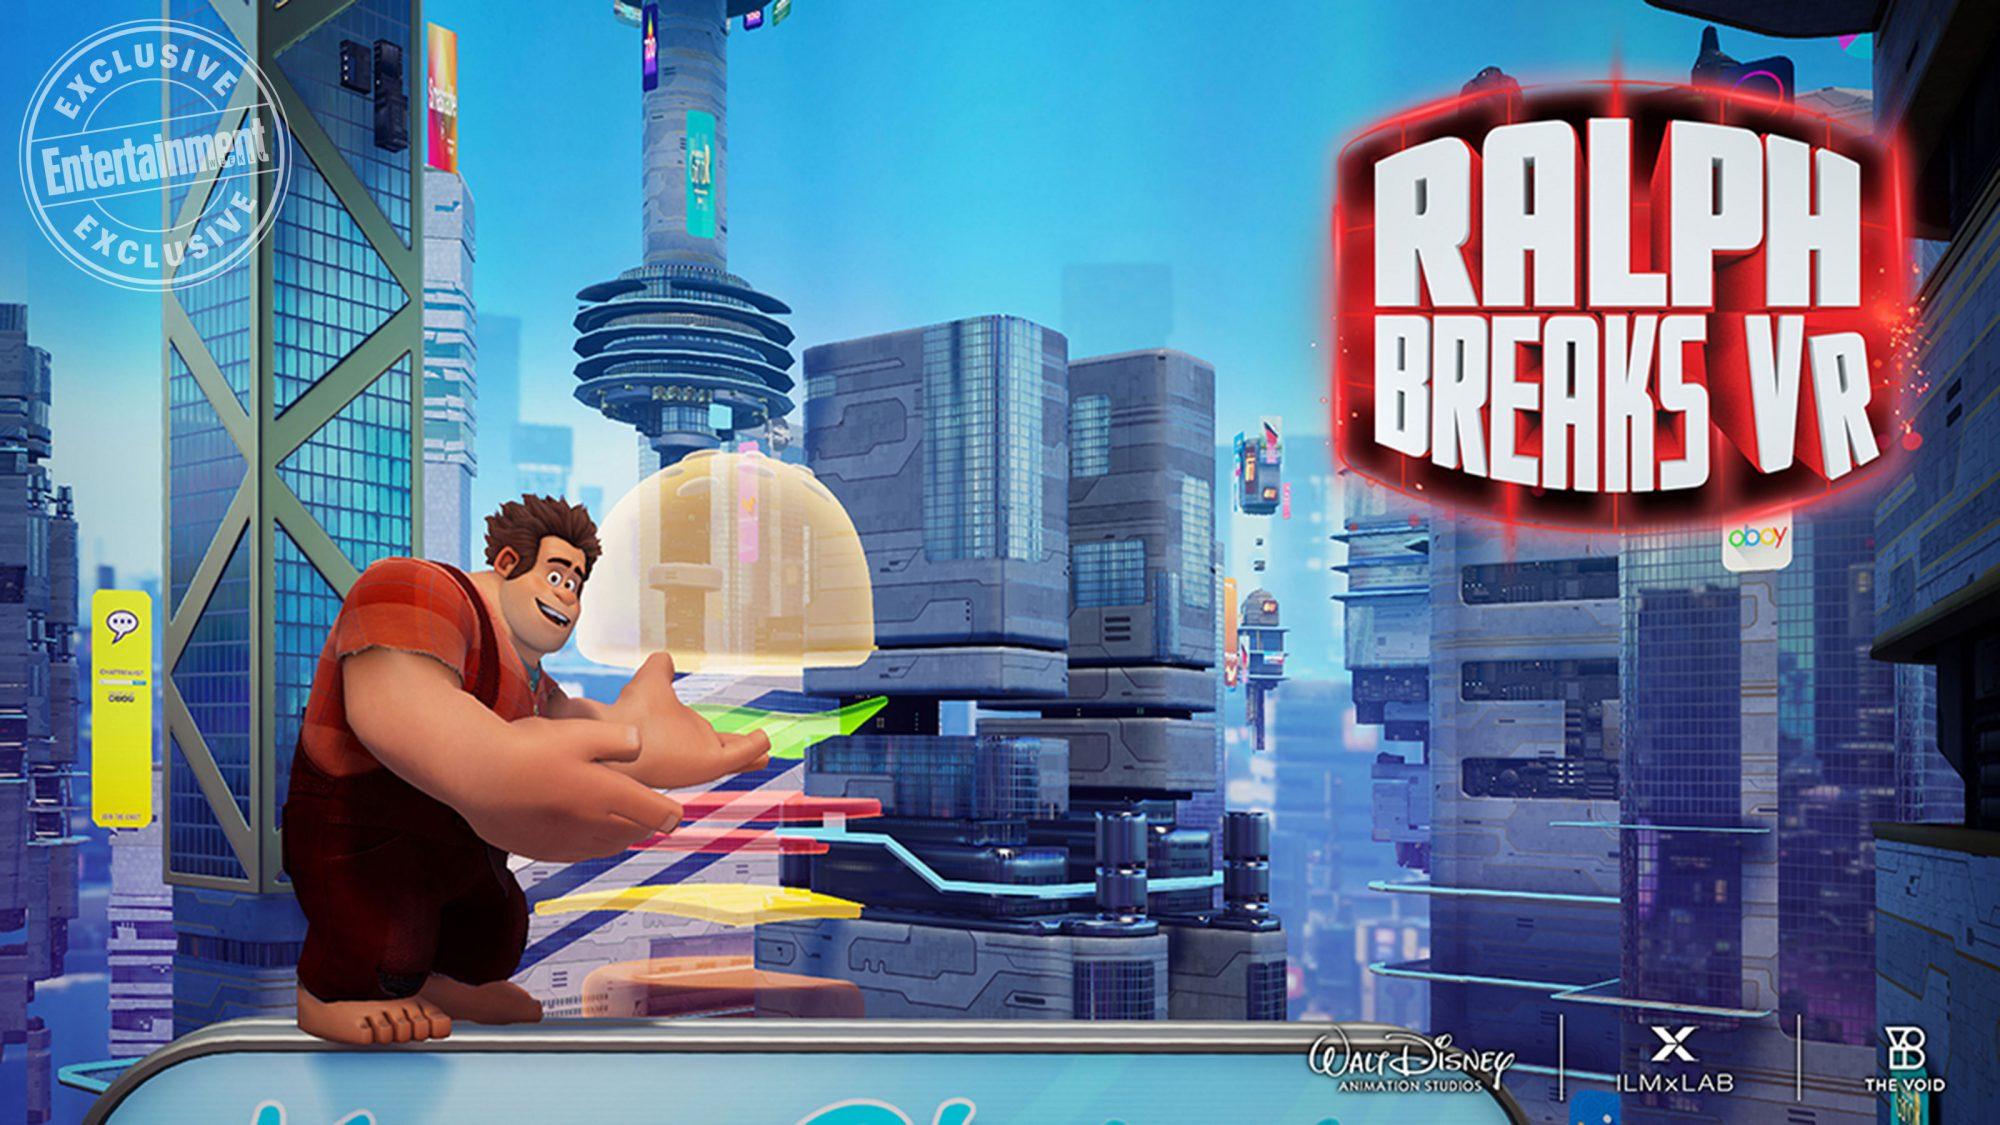 Ralph Breaks VRCR: Disney/VOID/ILMxLAB